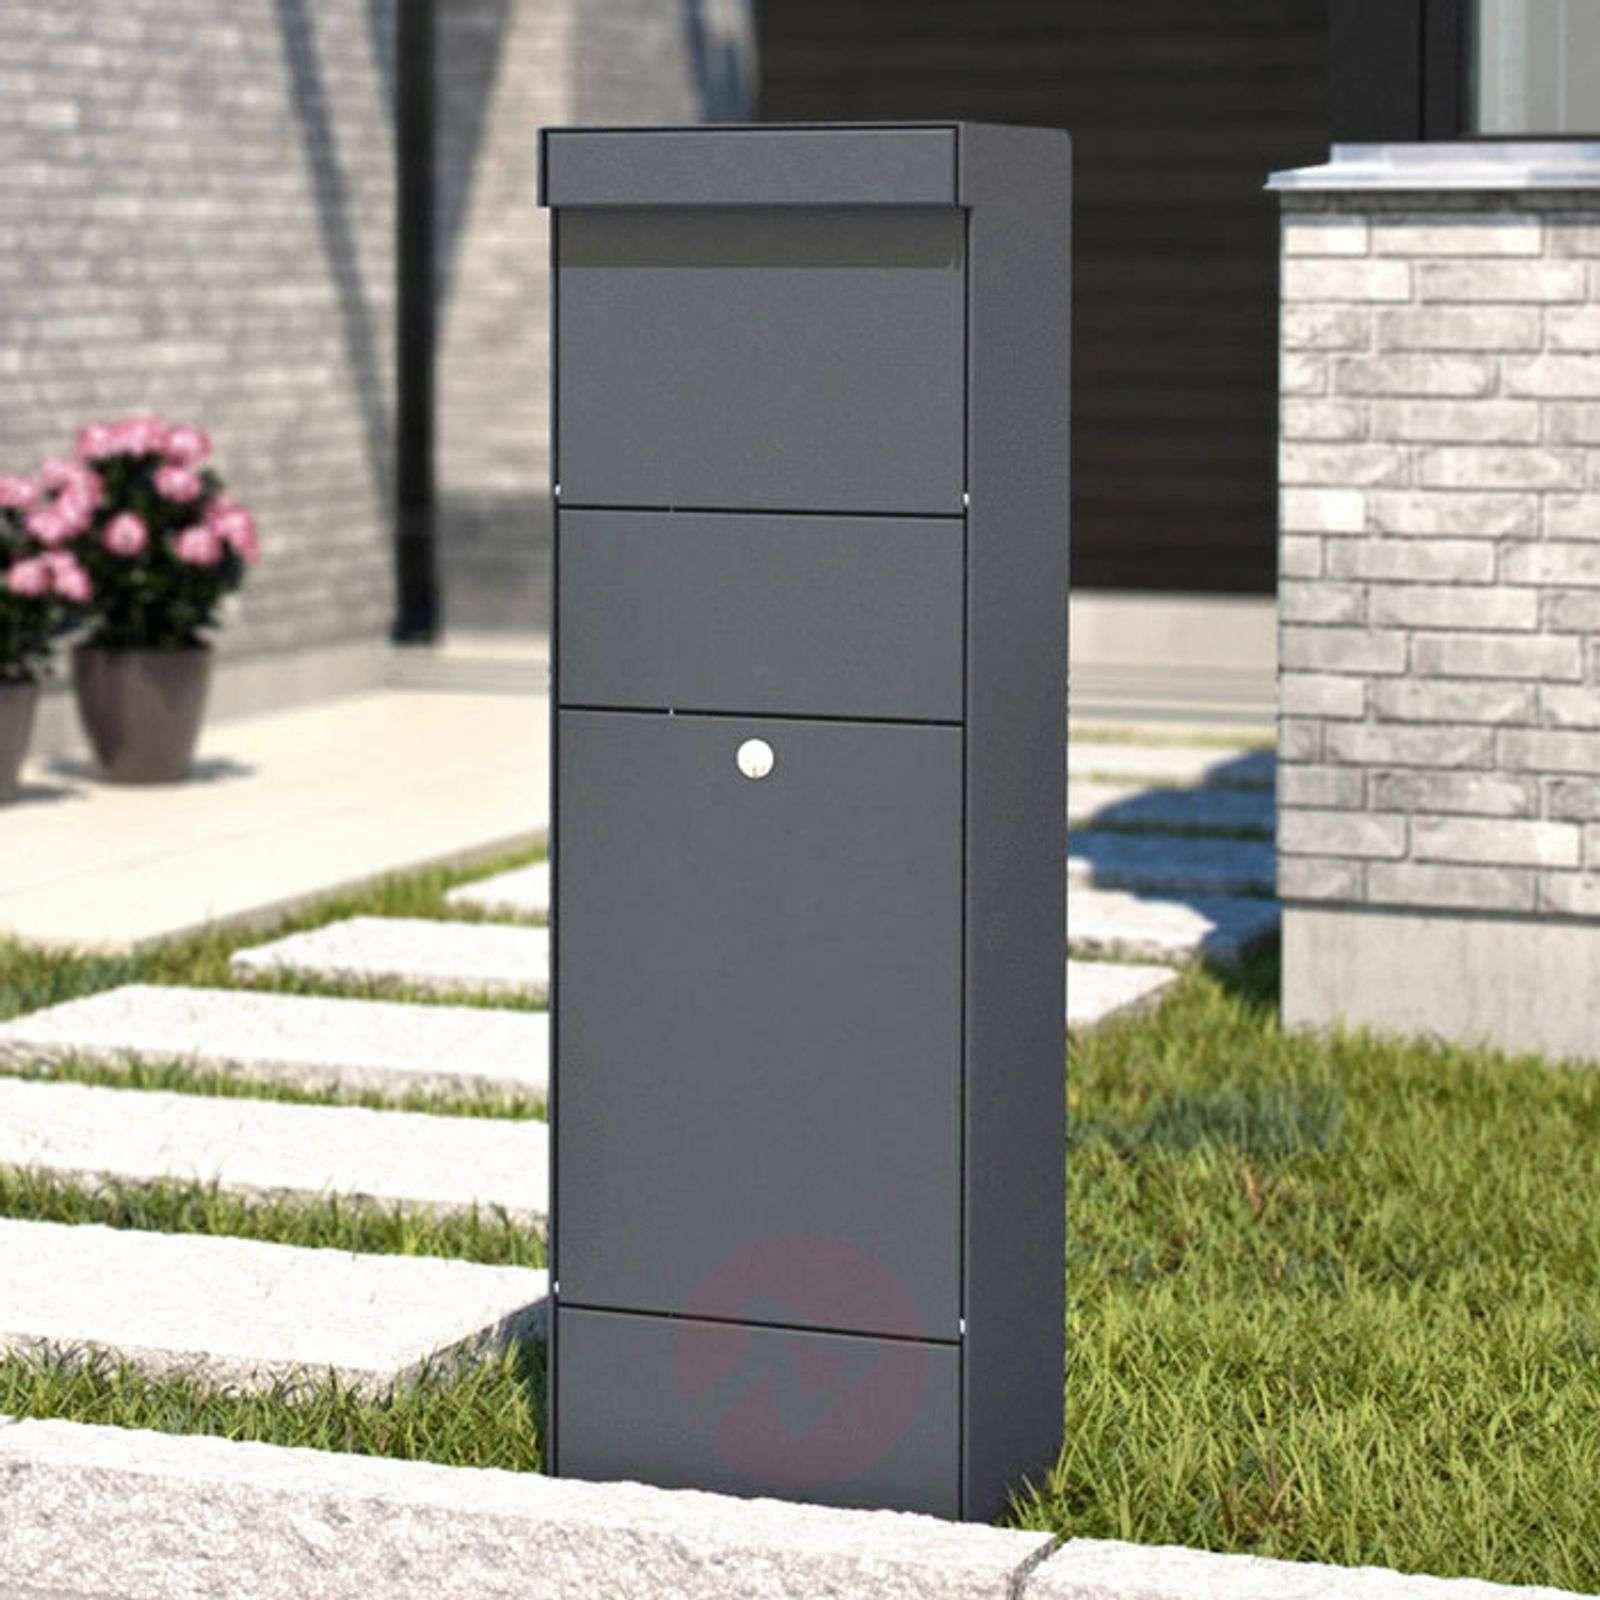 Pystypostilaatikko Parcel, antrasiitti-1045224-01